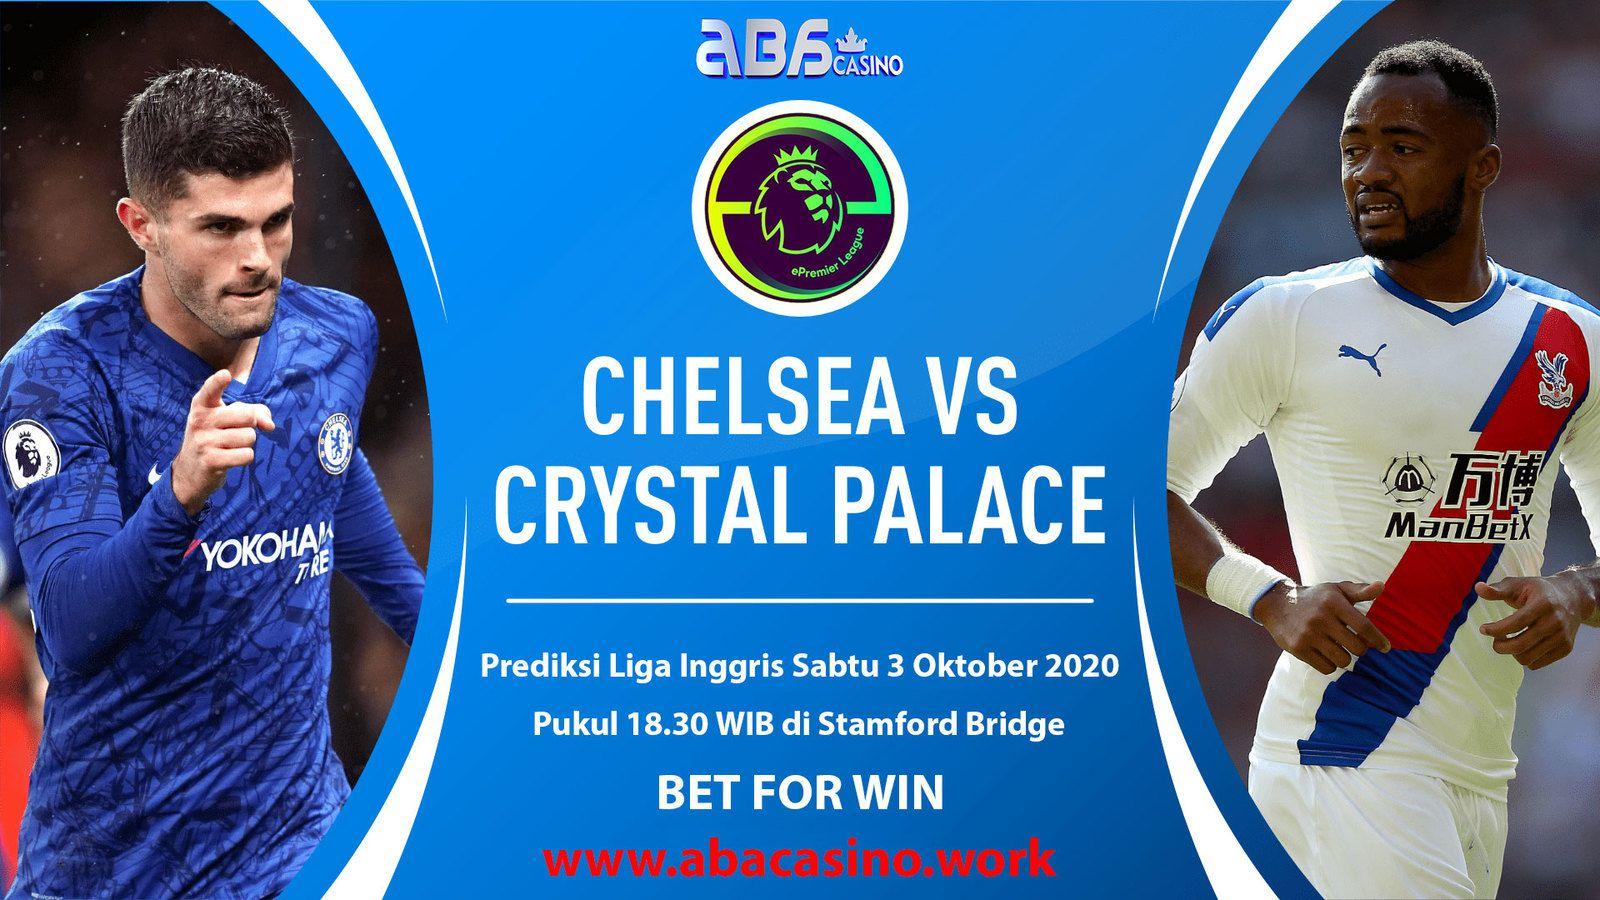 Prediksi Liga Inggris Chelsea vs Crystal Palace Sabtu 3 Oktober 2020